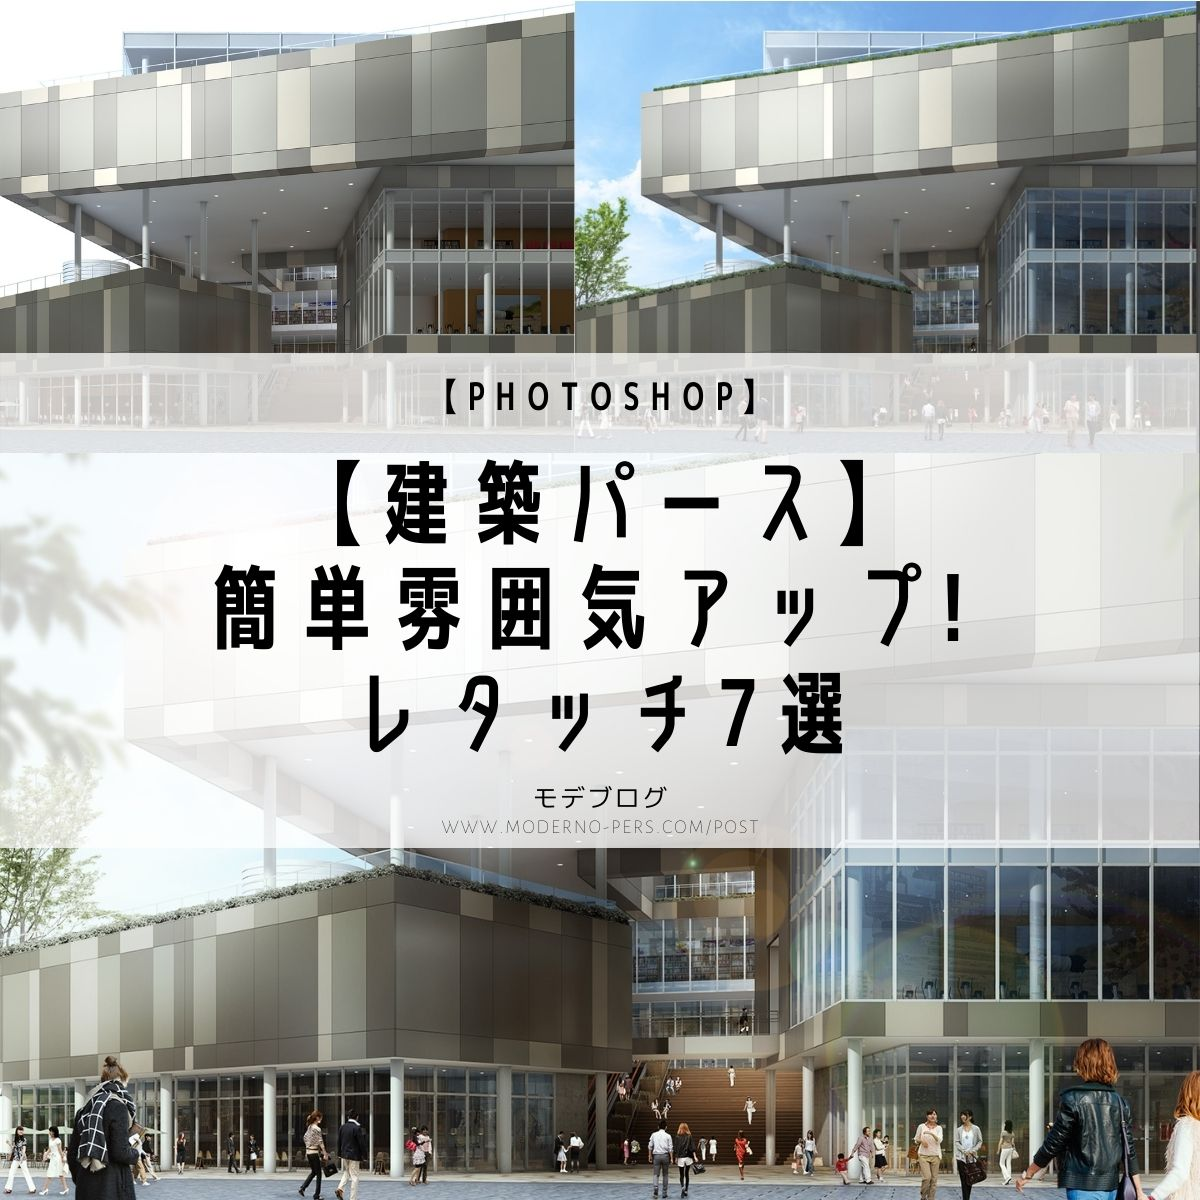 【Photoshop】簡単雰囲気アップ! レタッチ7選【建築パース】